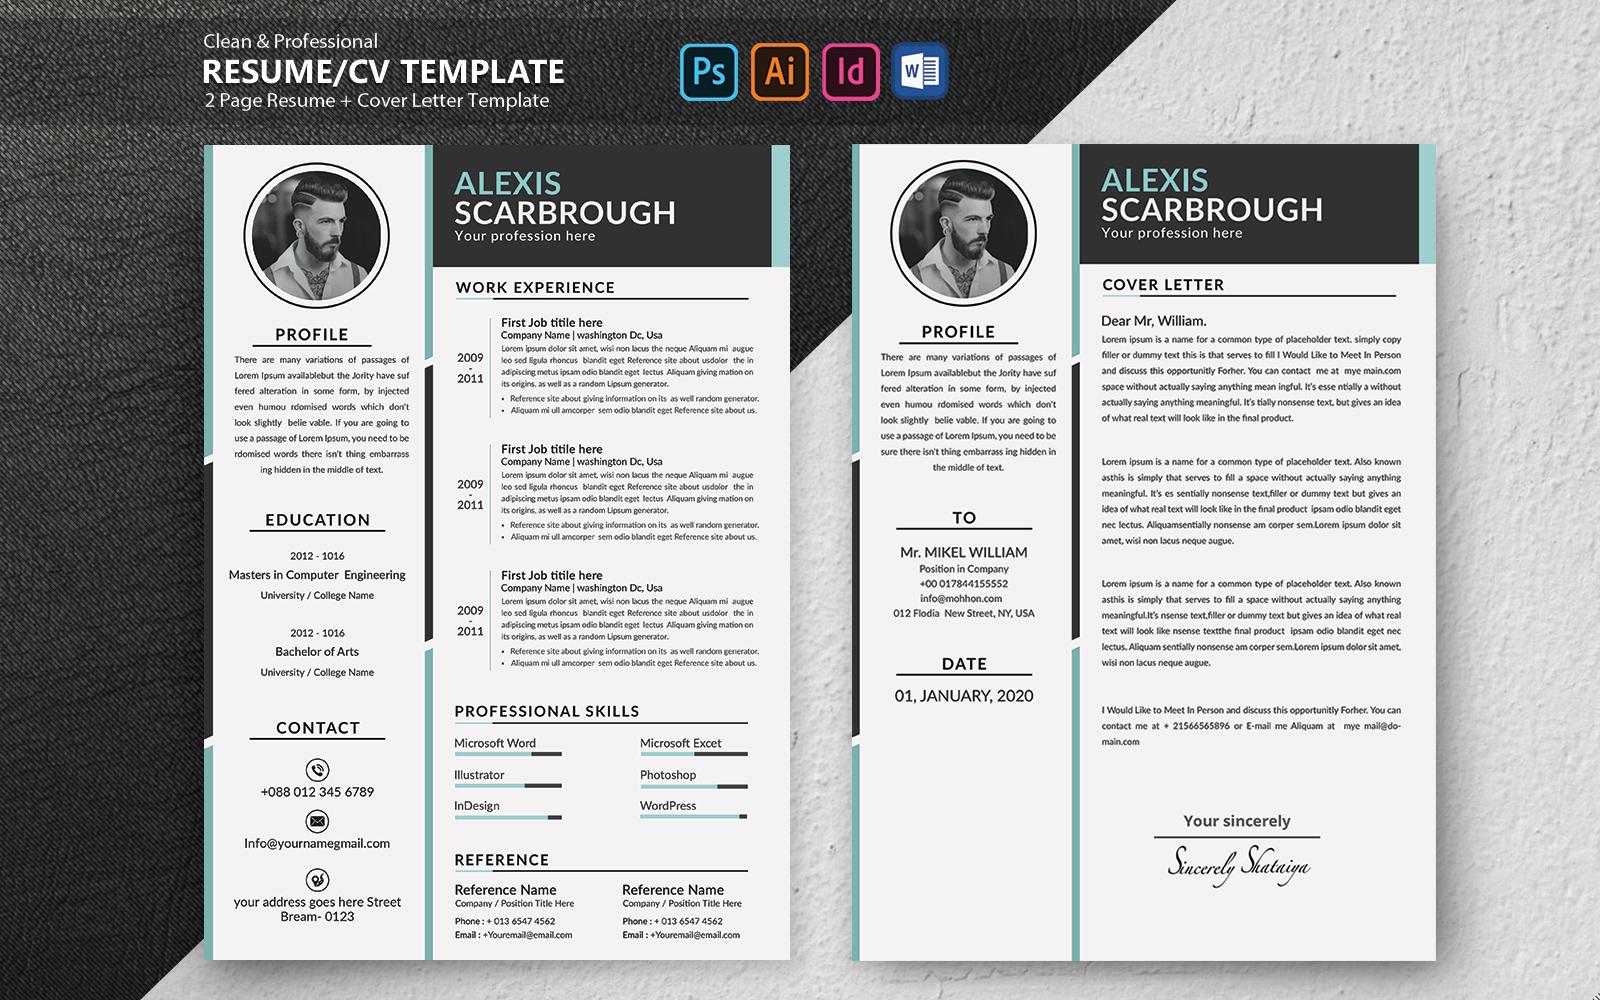 Alexis Scarbrough Resume Template